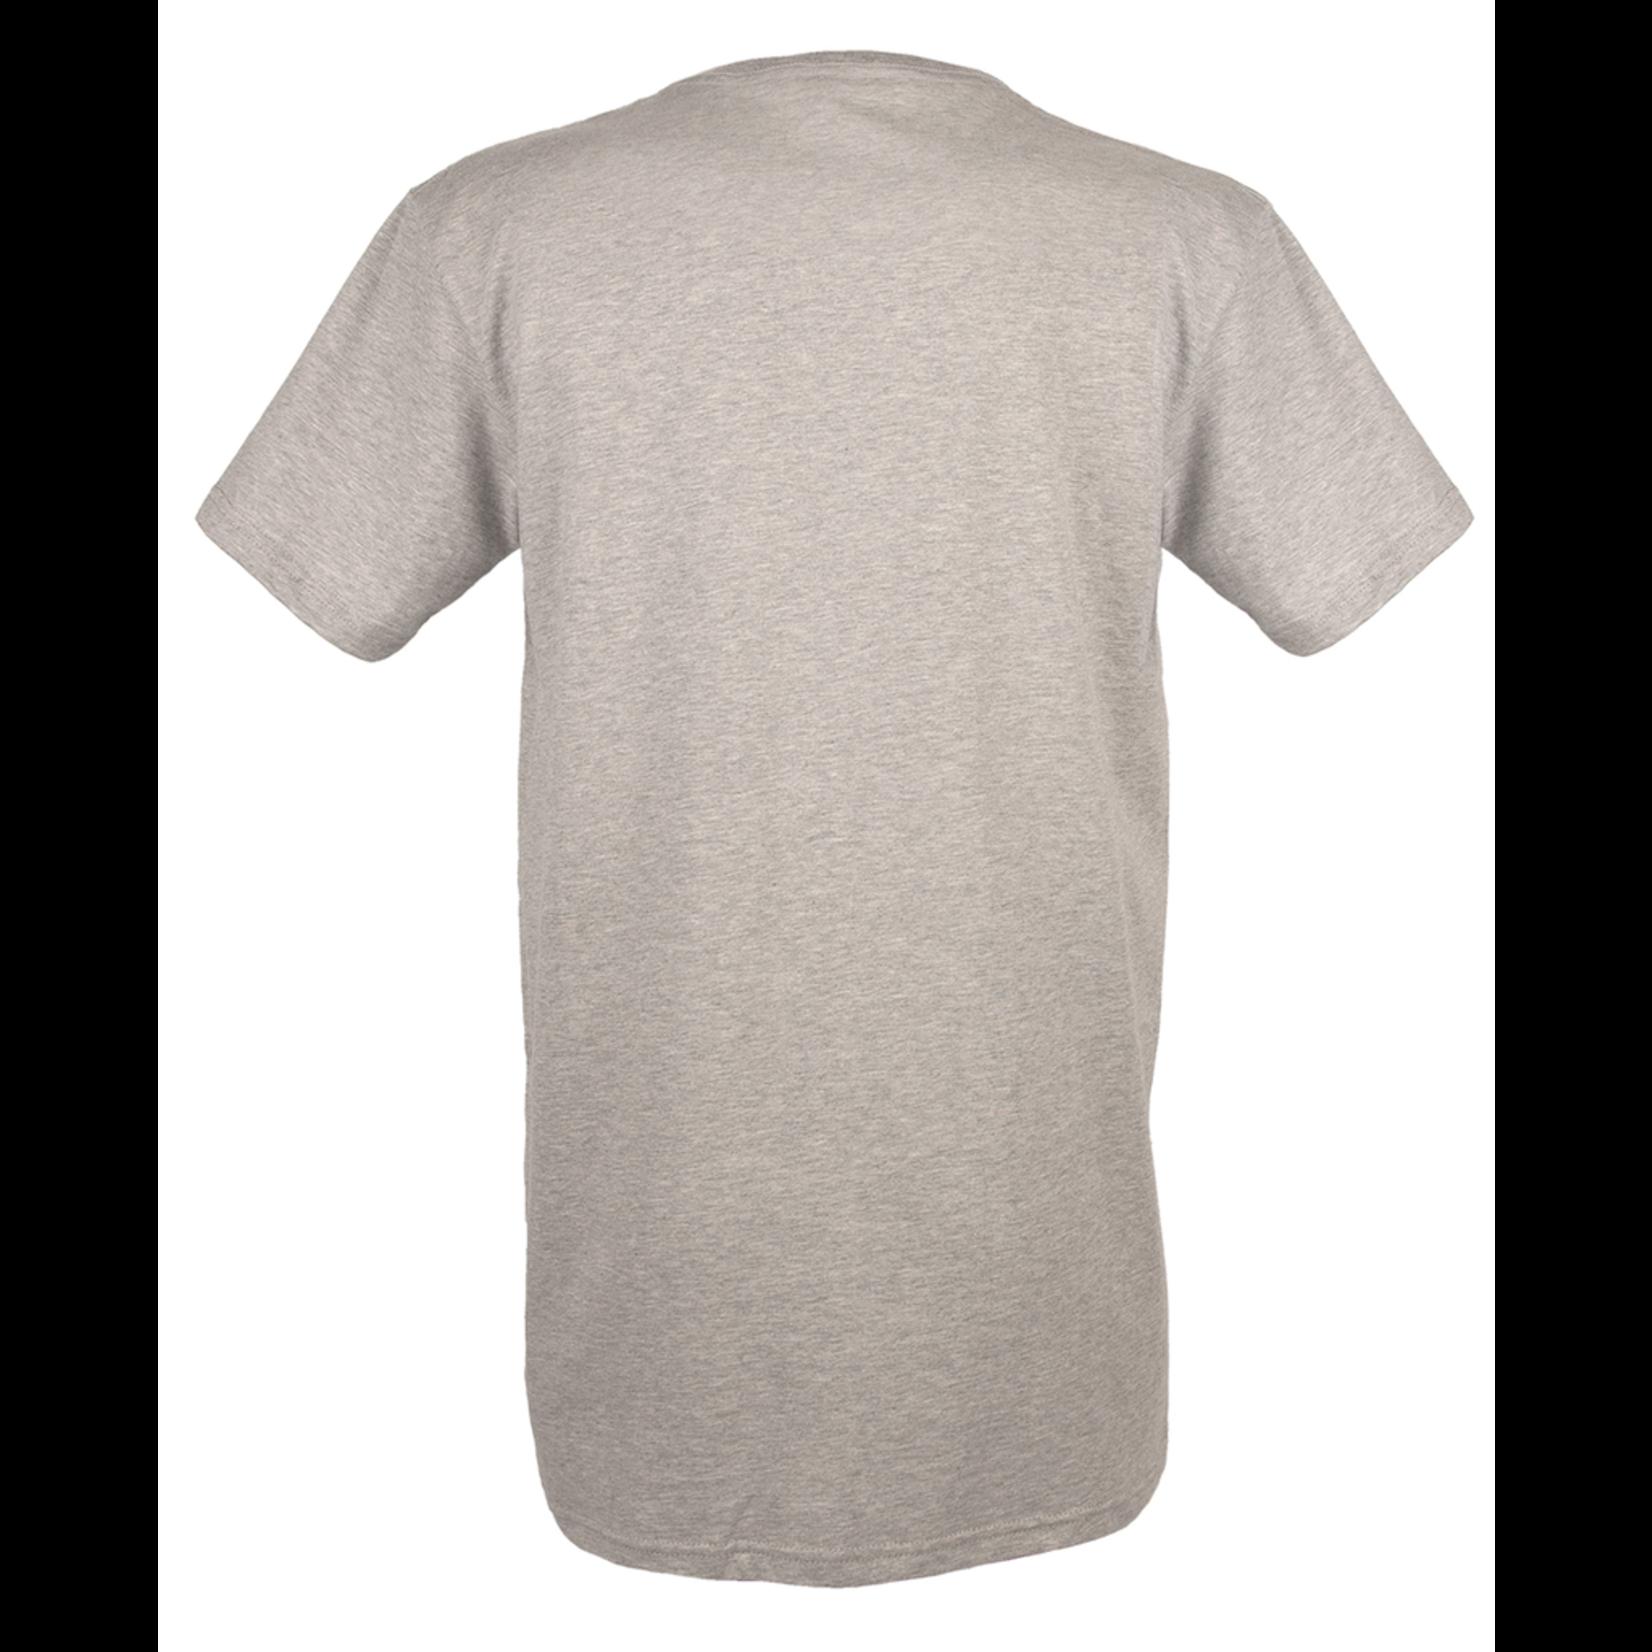 Clothing Tshirt - Classic - Mr Seagull Grey